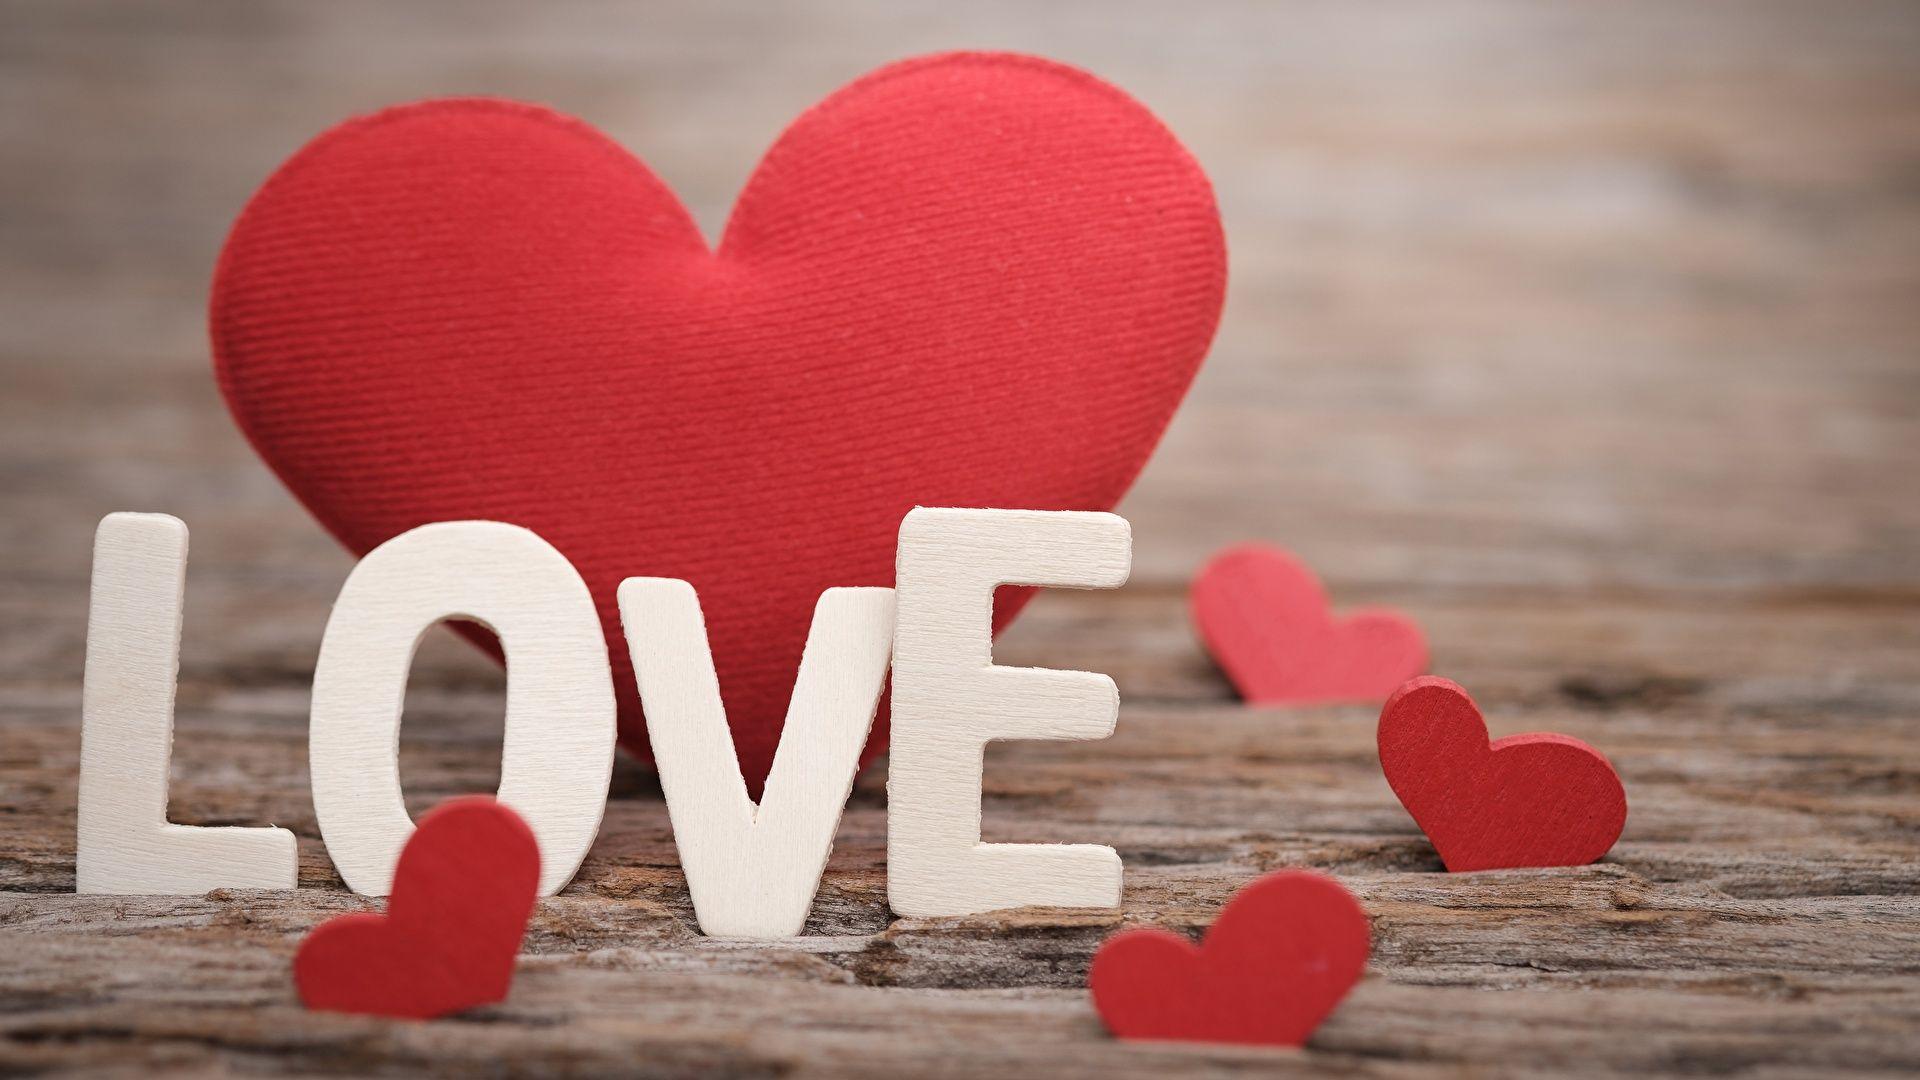 Image Of Love wallpaper for laptop